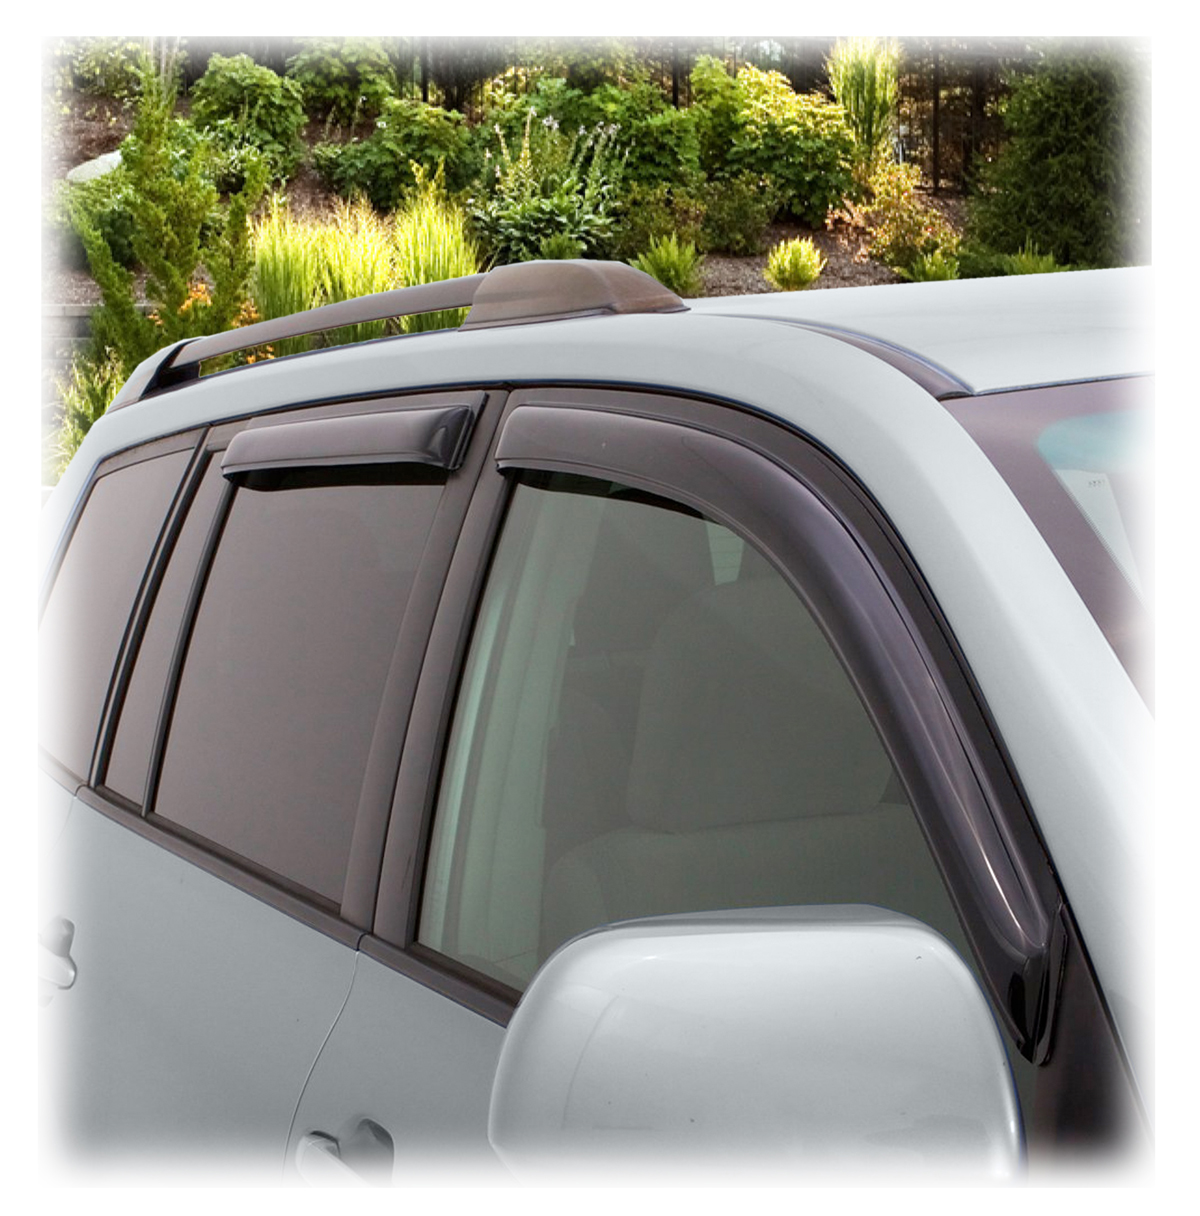 Car Window Rain Guards >> Tape-On Outside-Mount Window Visors, Rain Guards, Shades, Wind/Weather/Air/Snow/Vent Deflectors ...